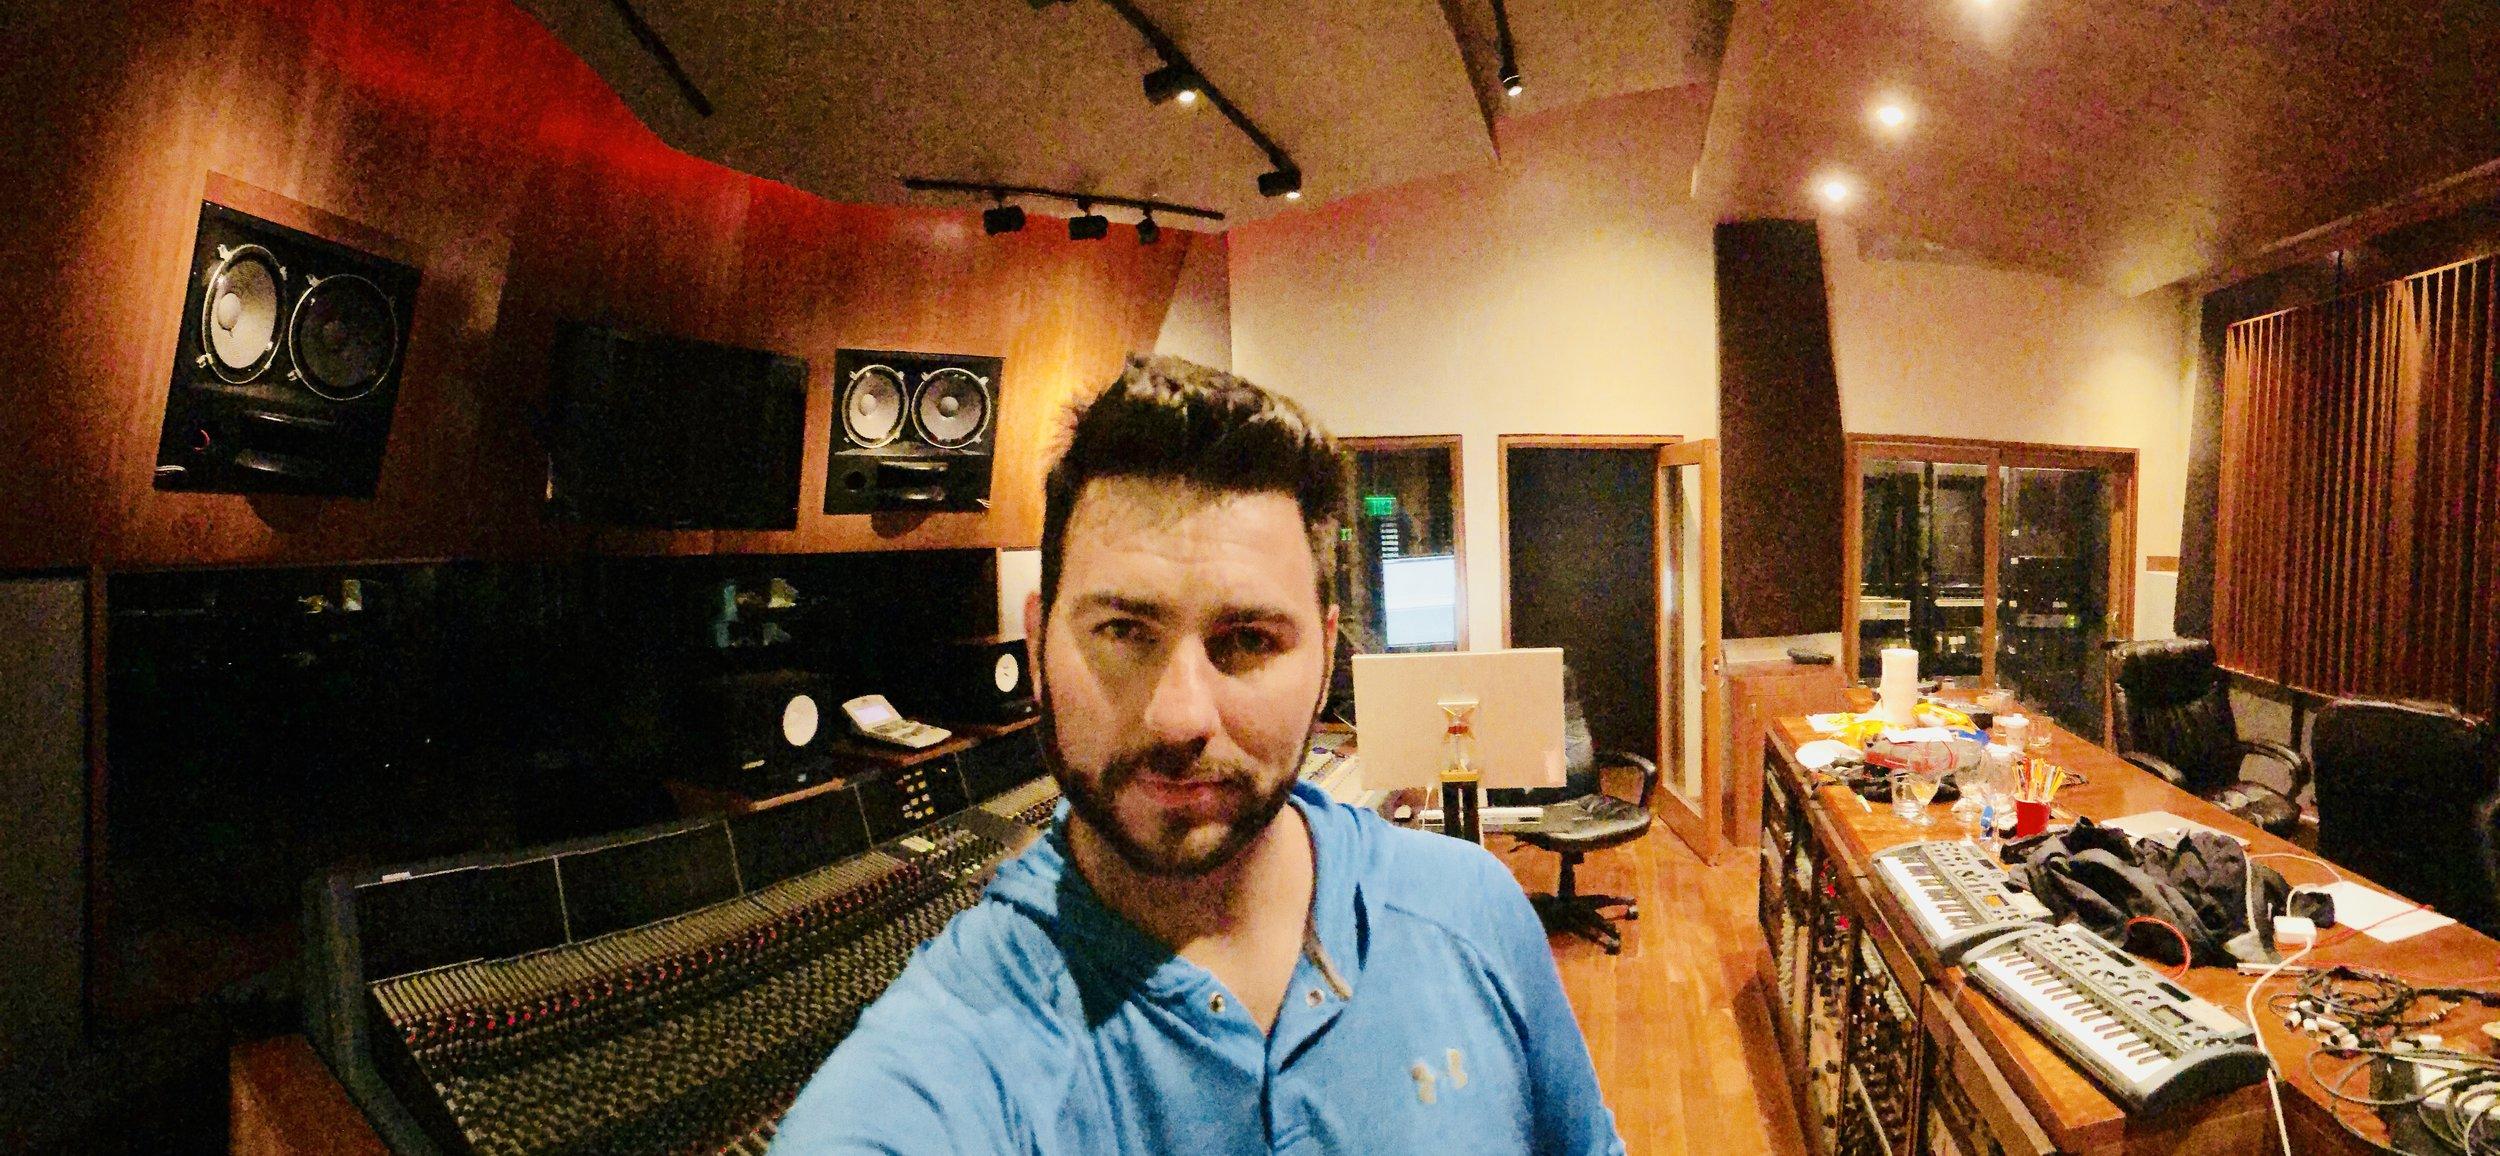 @ Thomas Crown Studios, Virginia Beach